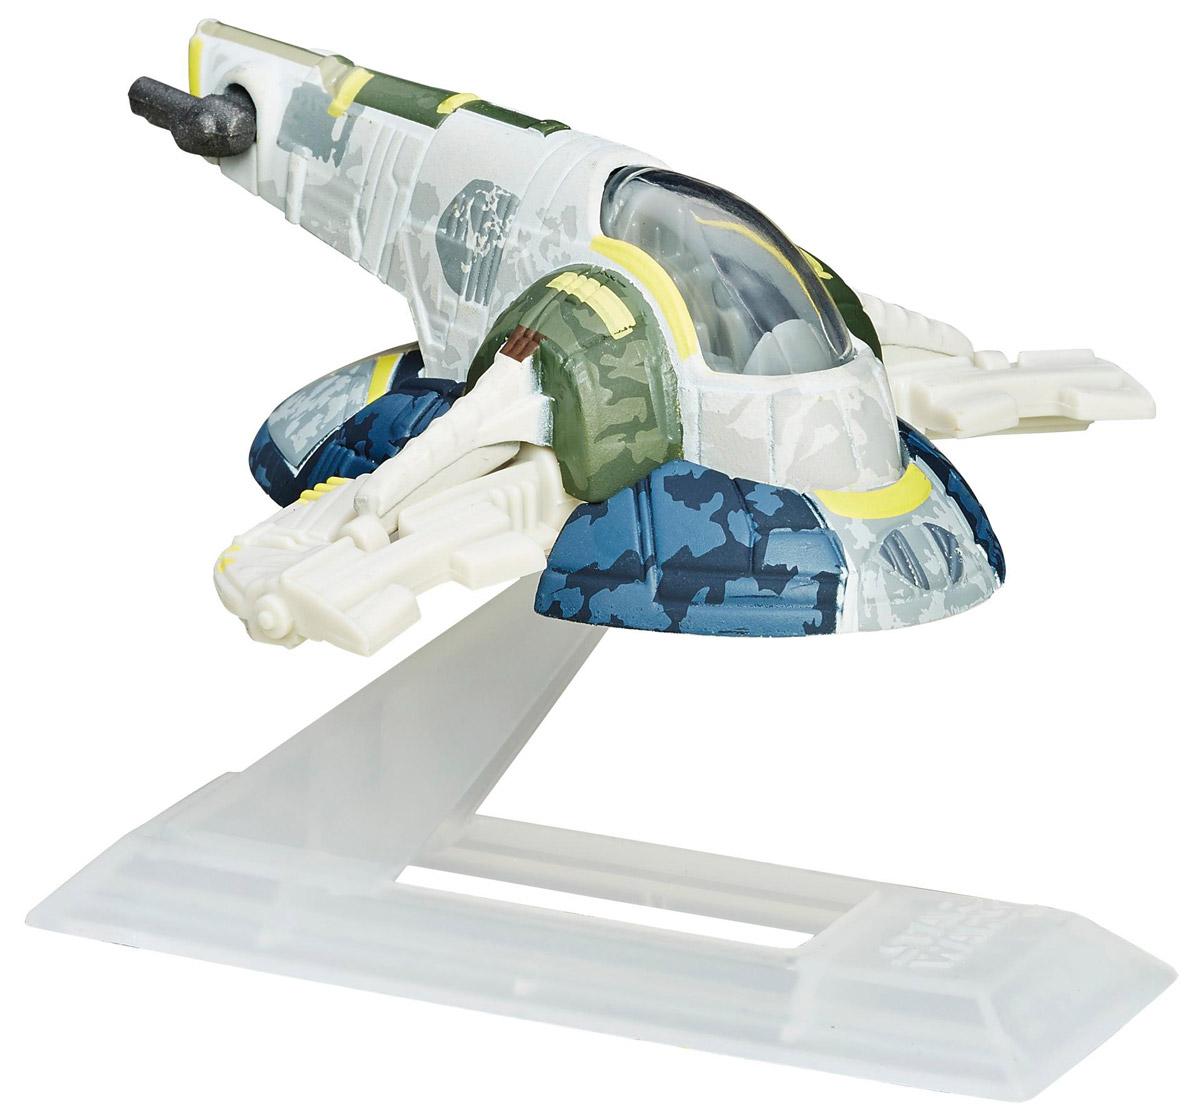 Star Wars Космический корабль Jango Fetts Slave I